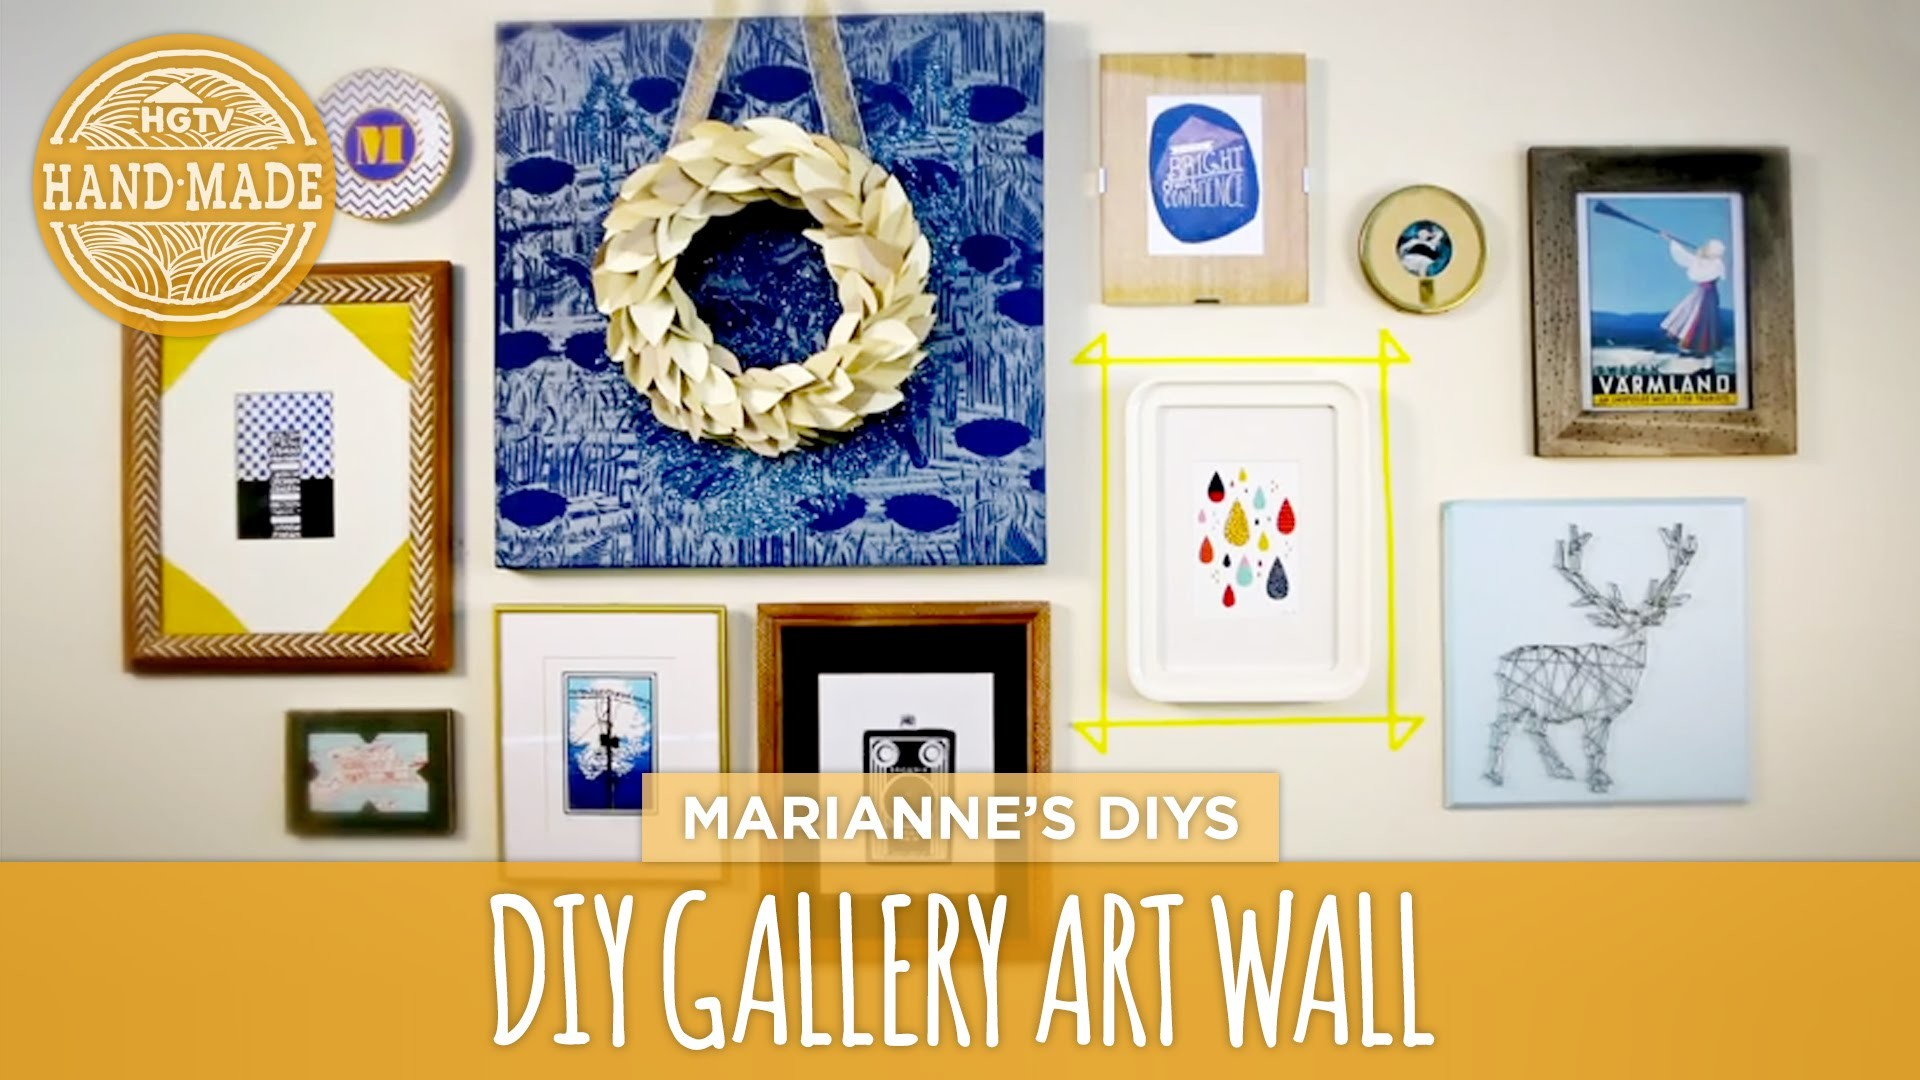 How To Make a Gallery Wall - HGTVHandmade